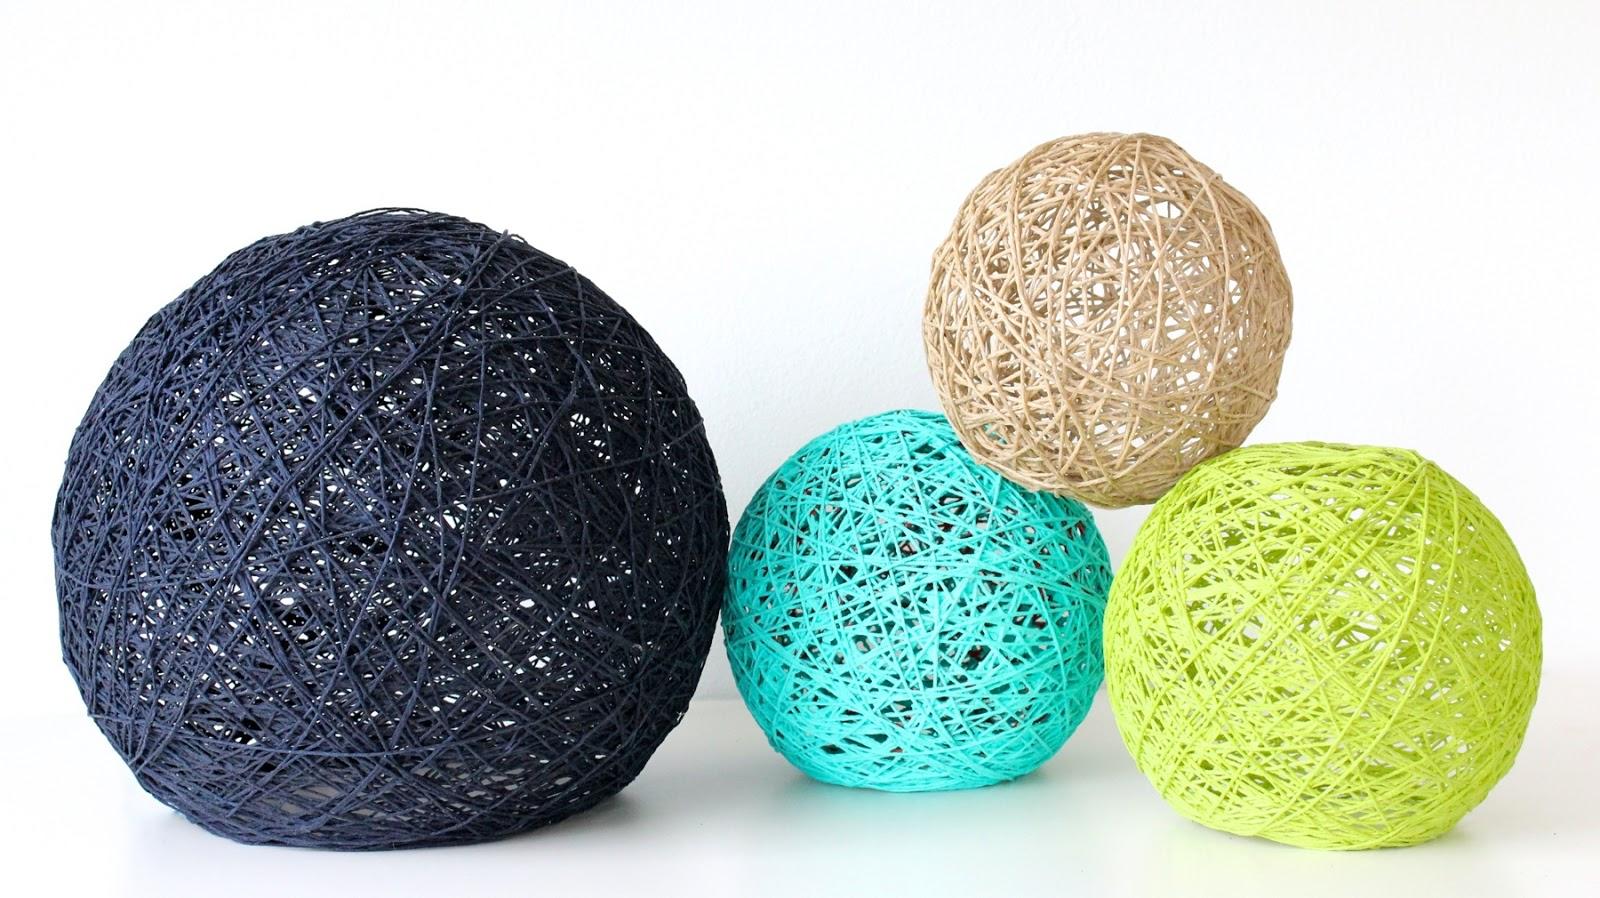 Декоративный шар из ниток своими руками. Мастер-класс 26